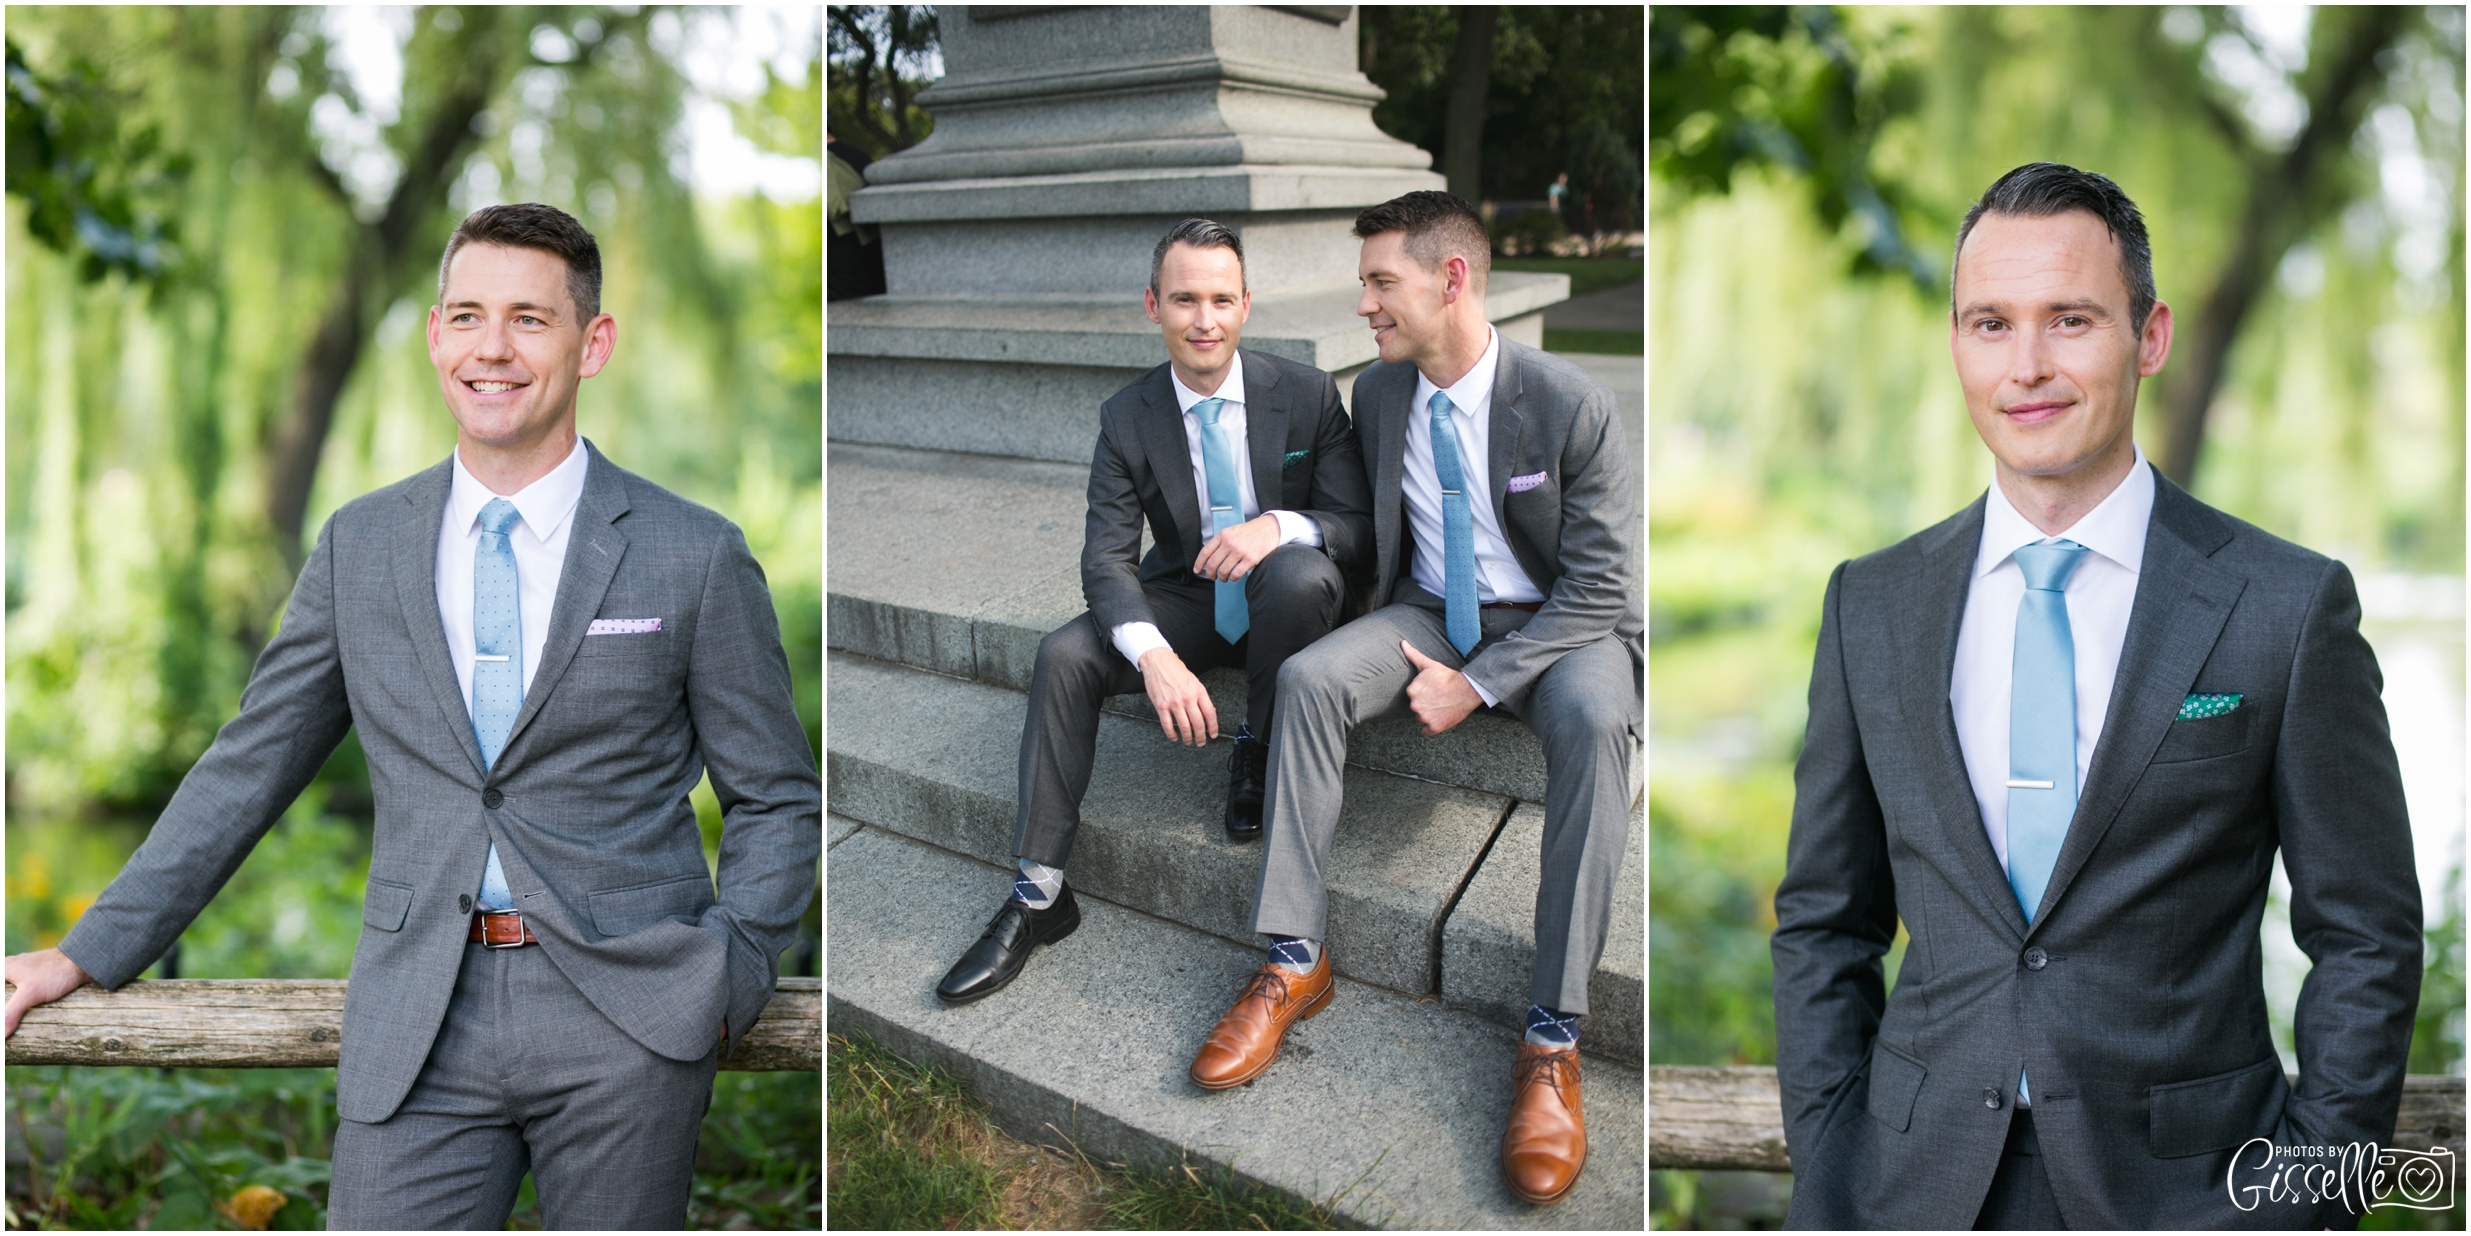 Lincoln Park Wedding_0001.jpg